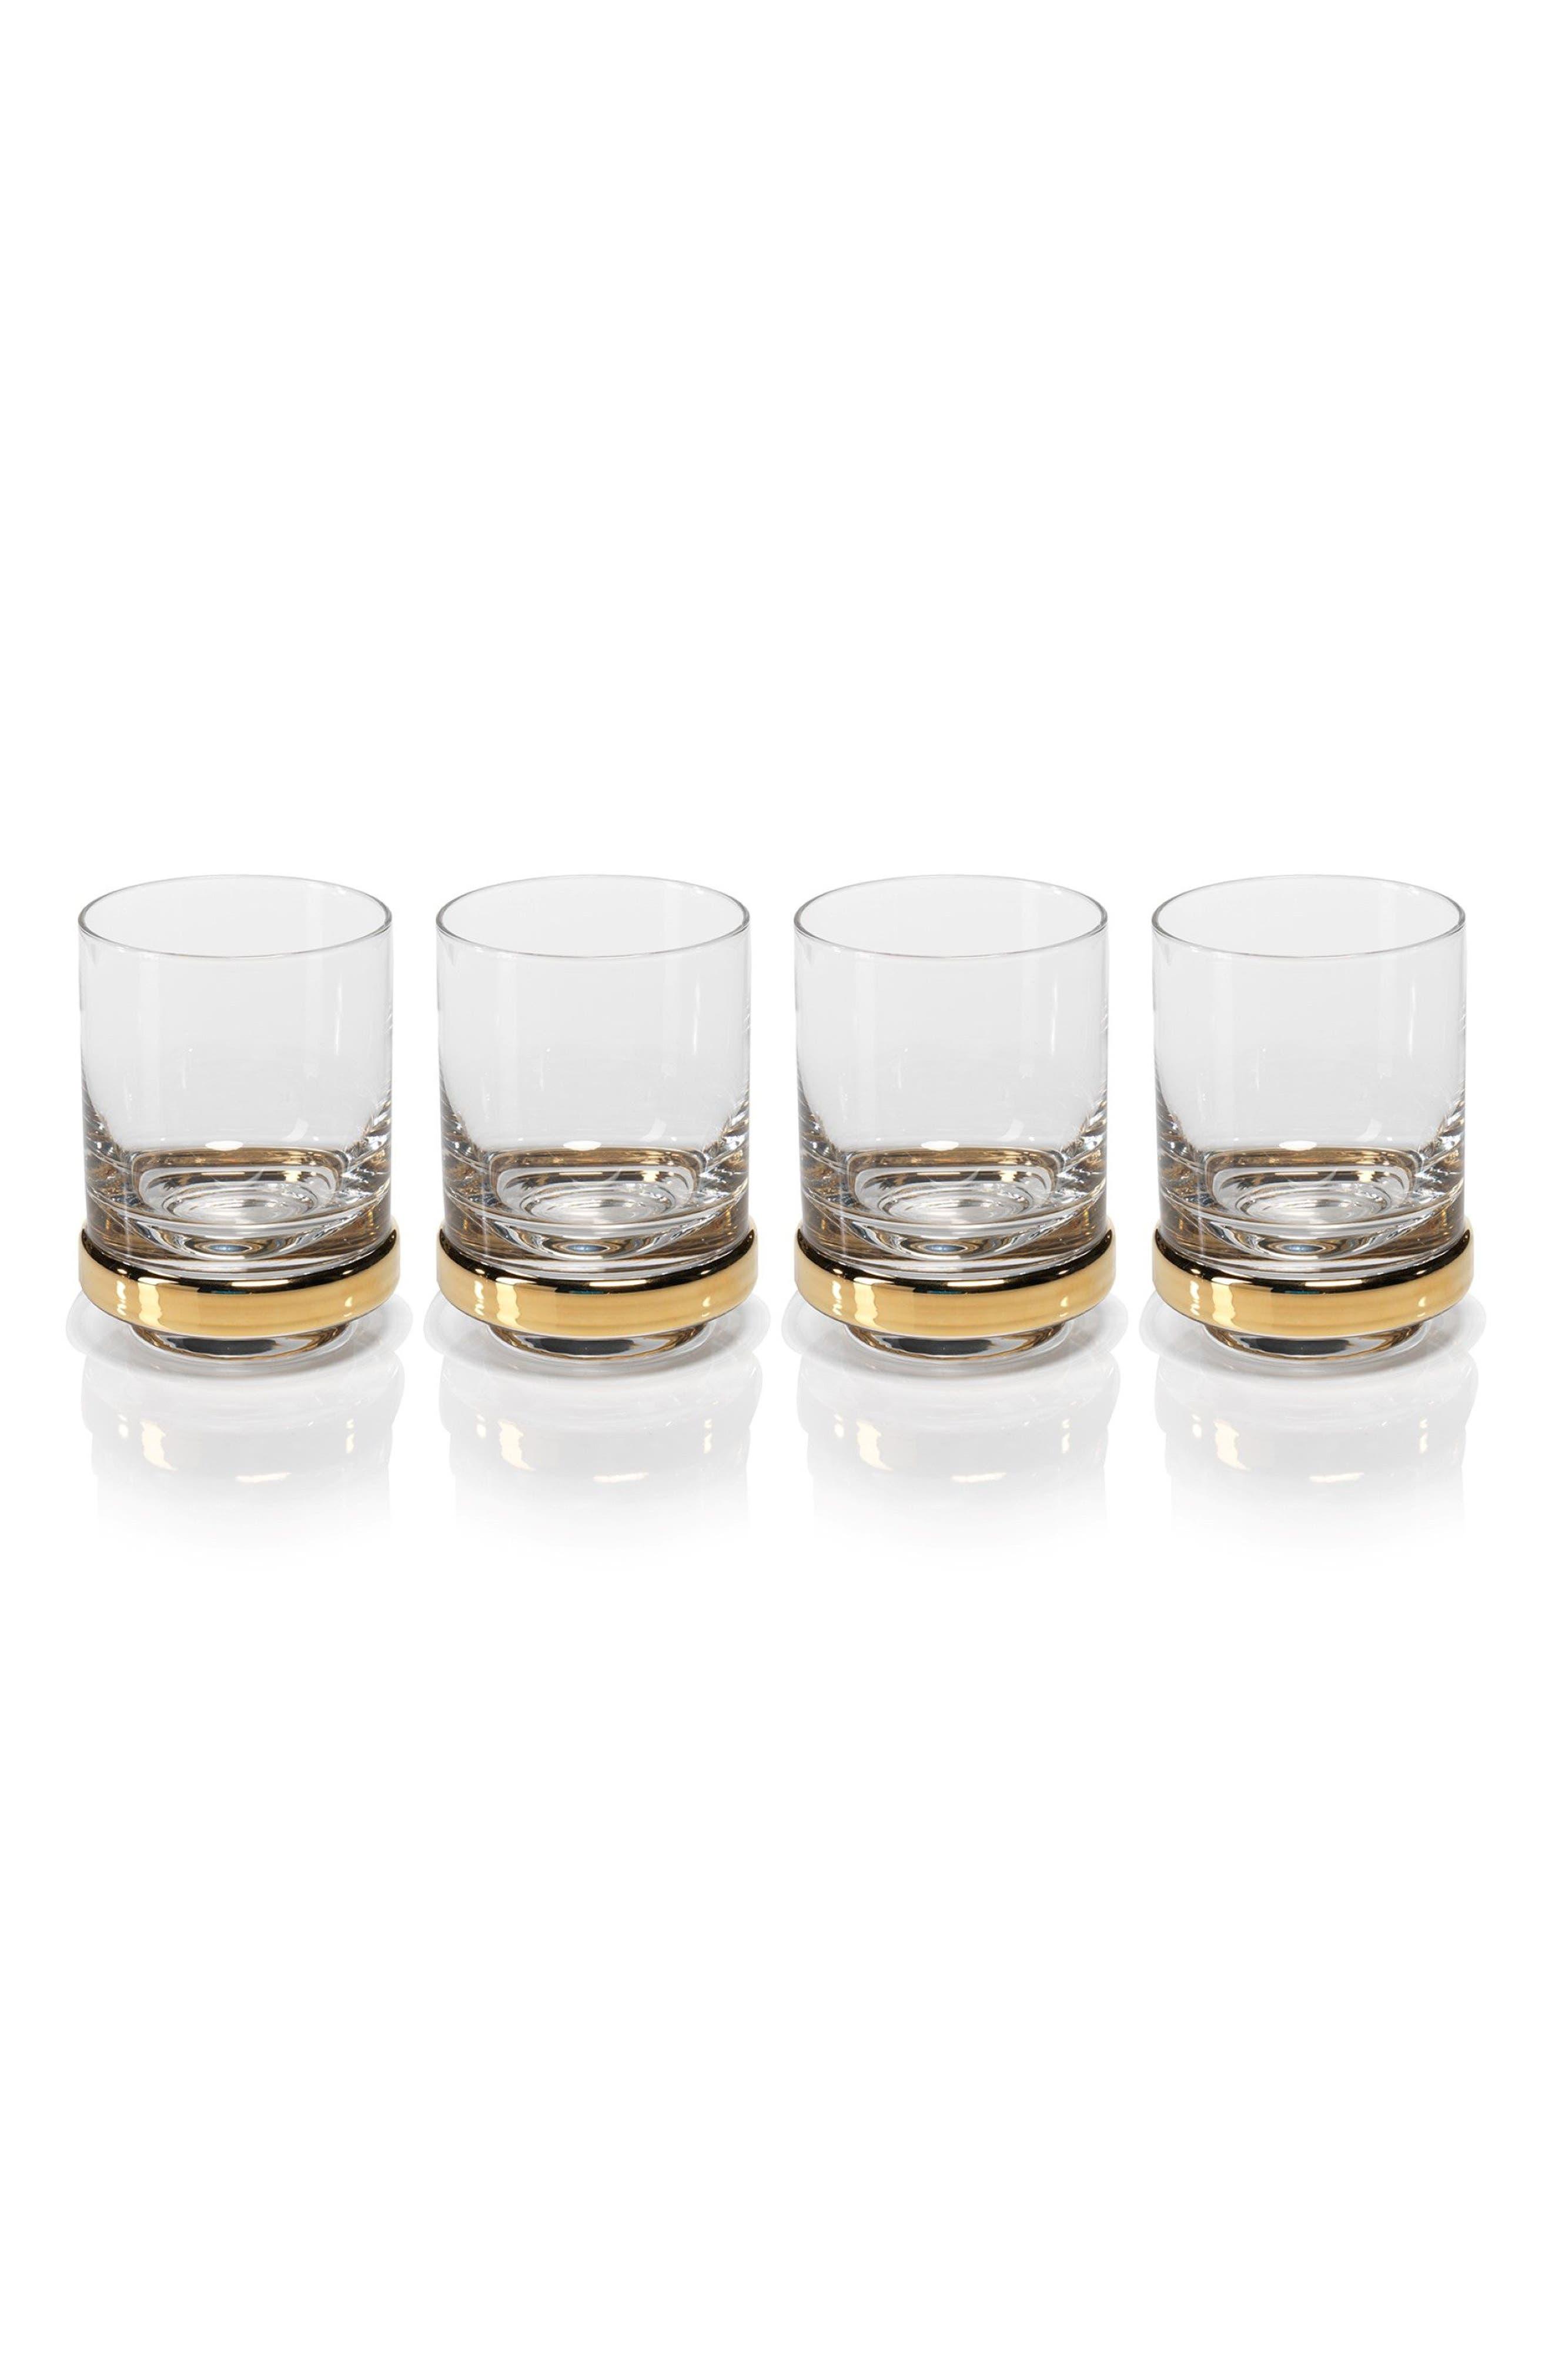 Artu Set of 4 Double Old Fashioned Glasses,                             Main thumbnail 1, color,                             710